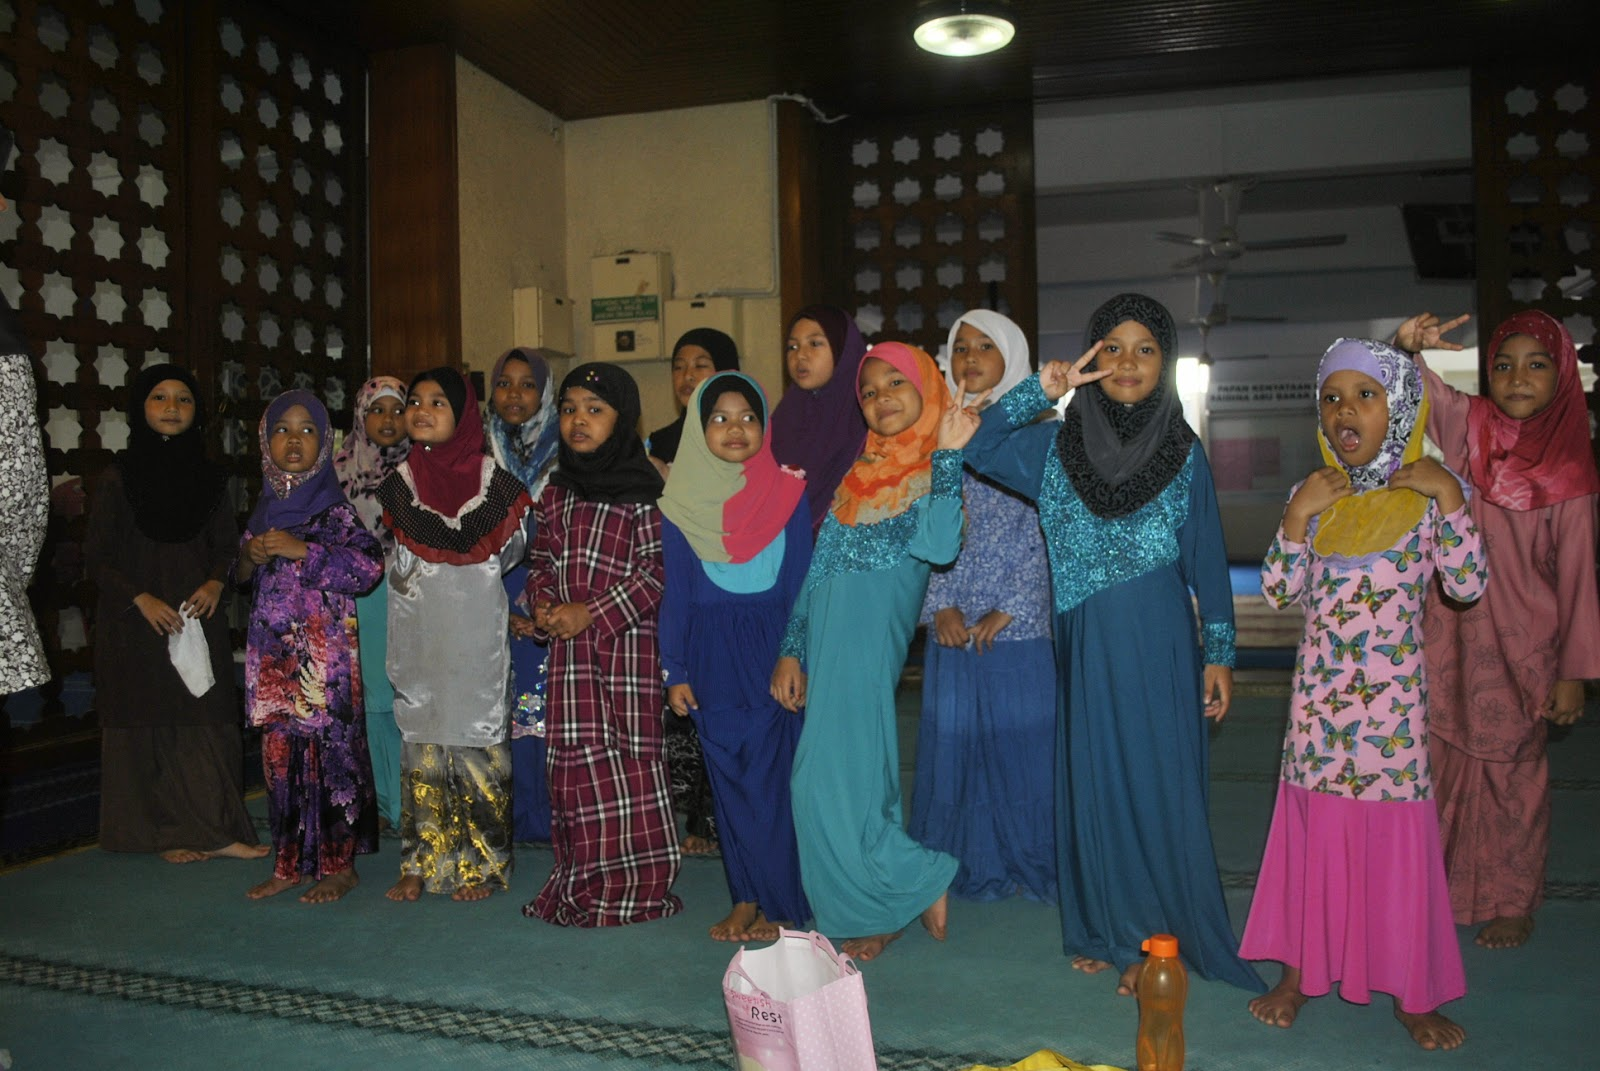 Masjid Saidina Abu Bakar As Siddiq, Bangsar.: BENGKEL IBADAT SEMPURNA